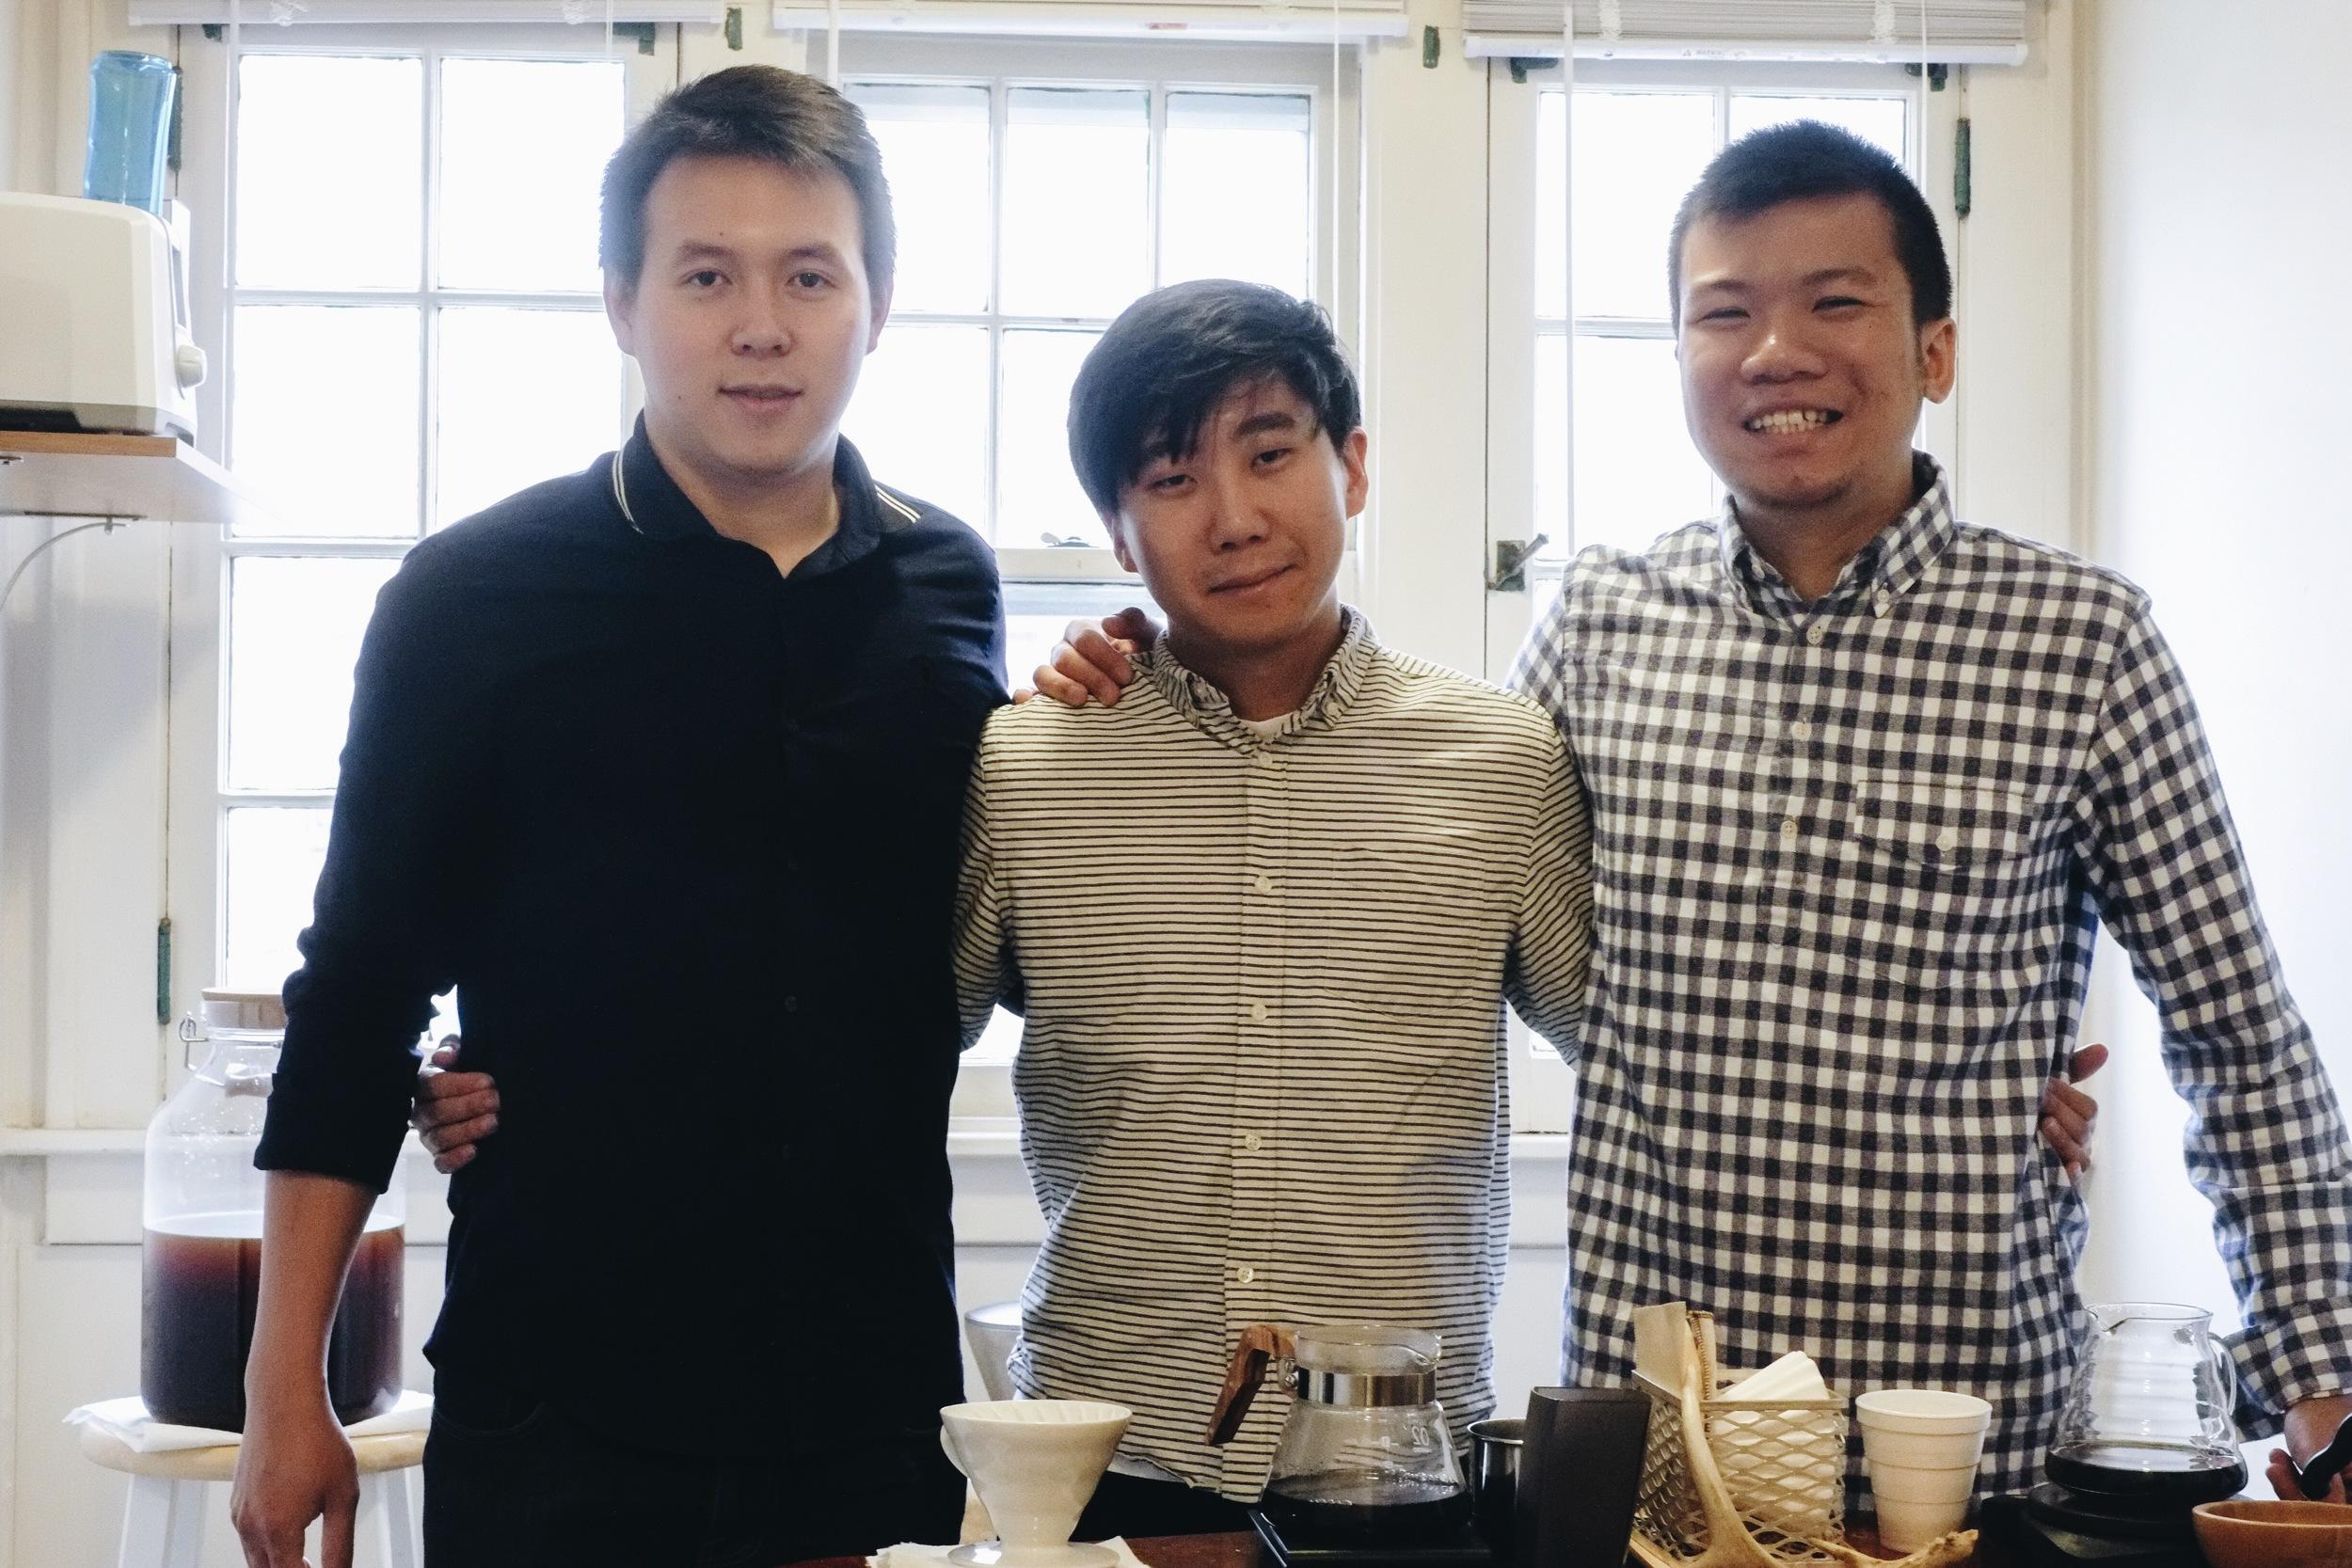 Left to right: Niko, Sam, Sean